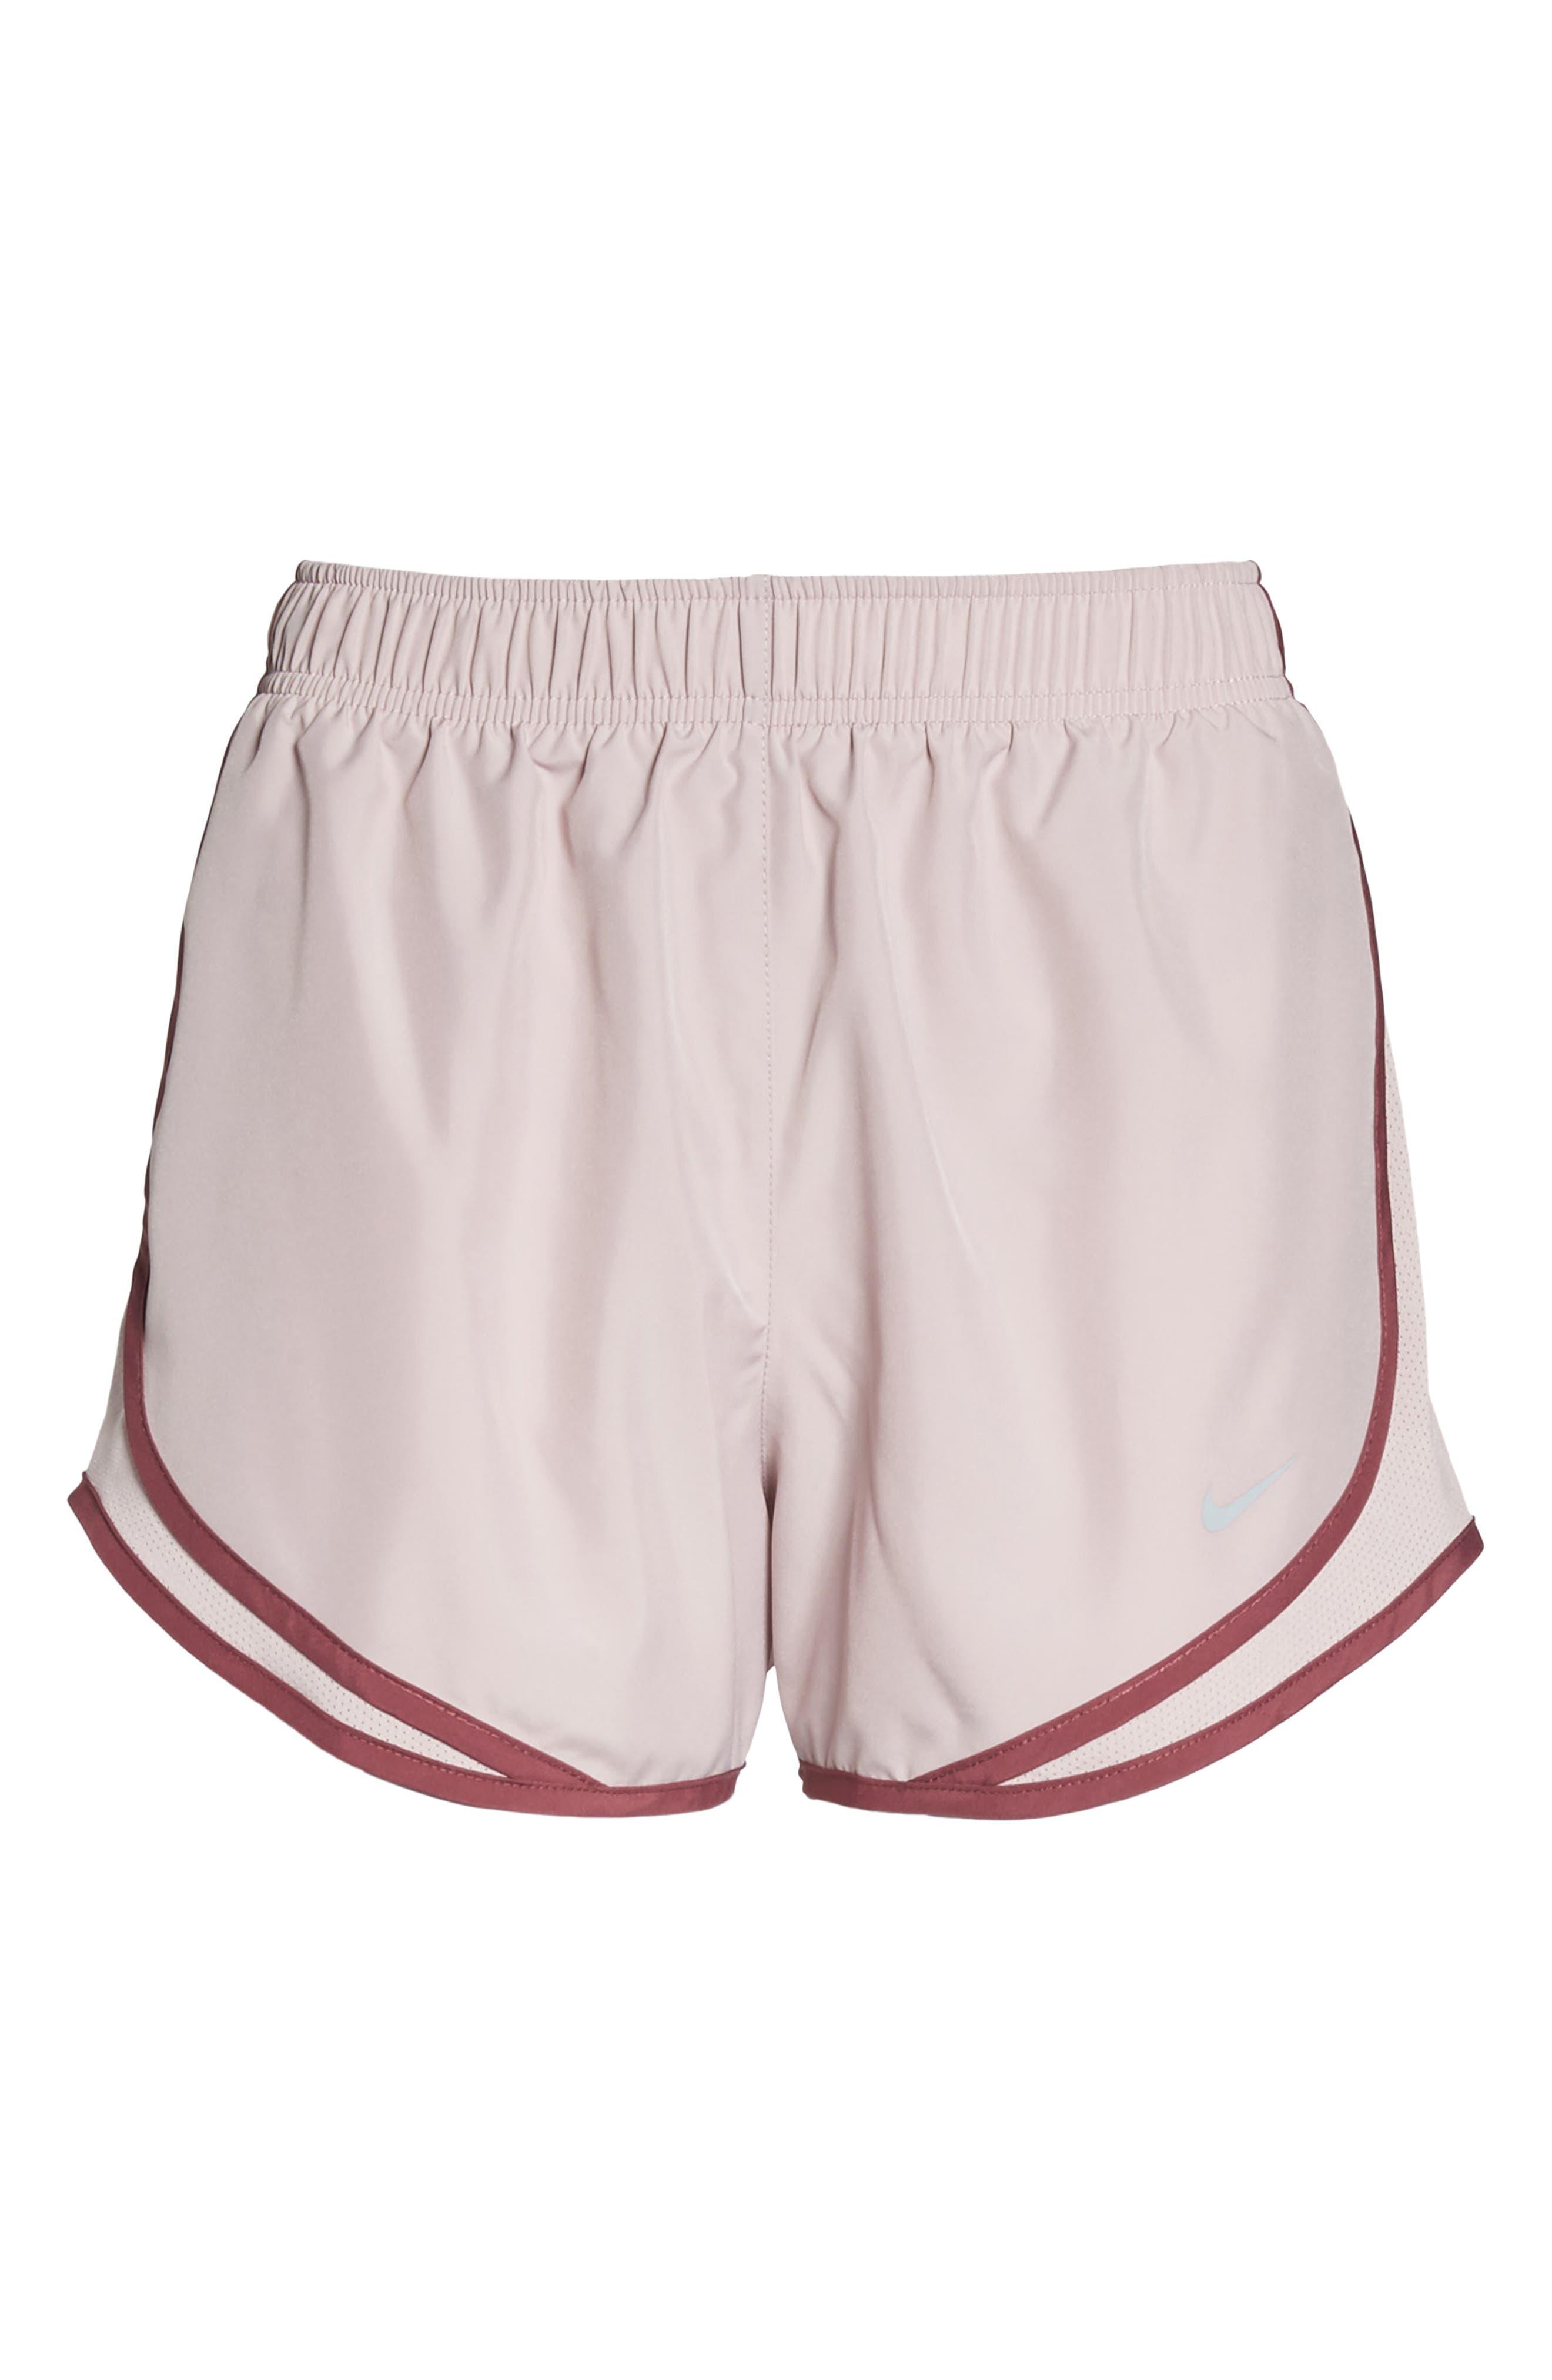 Dry Tempo Running Shorts,                             Alternate thumbnail 452, color,